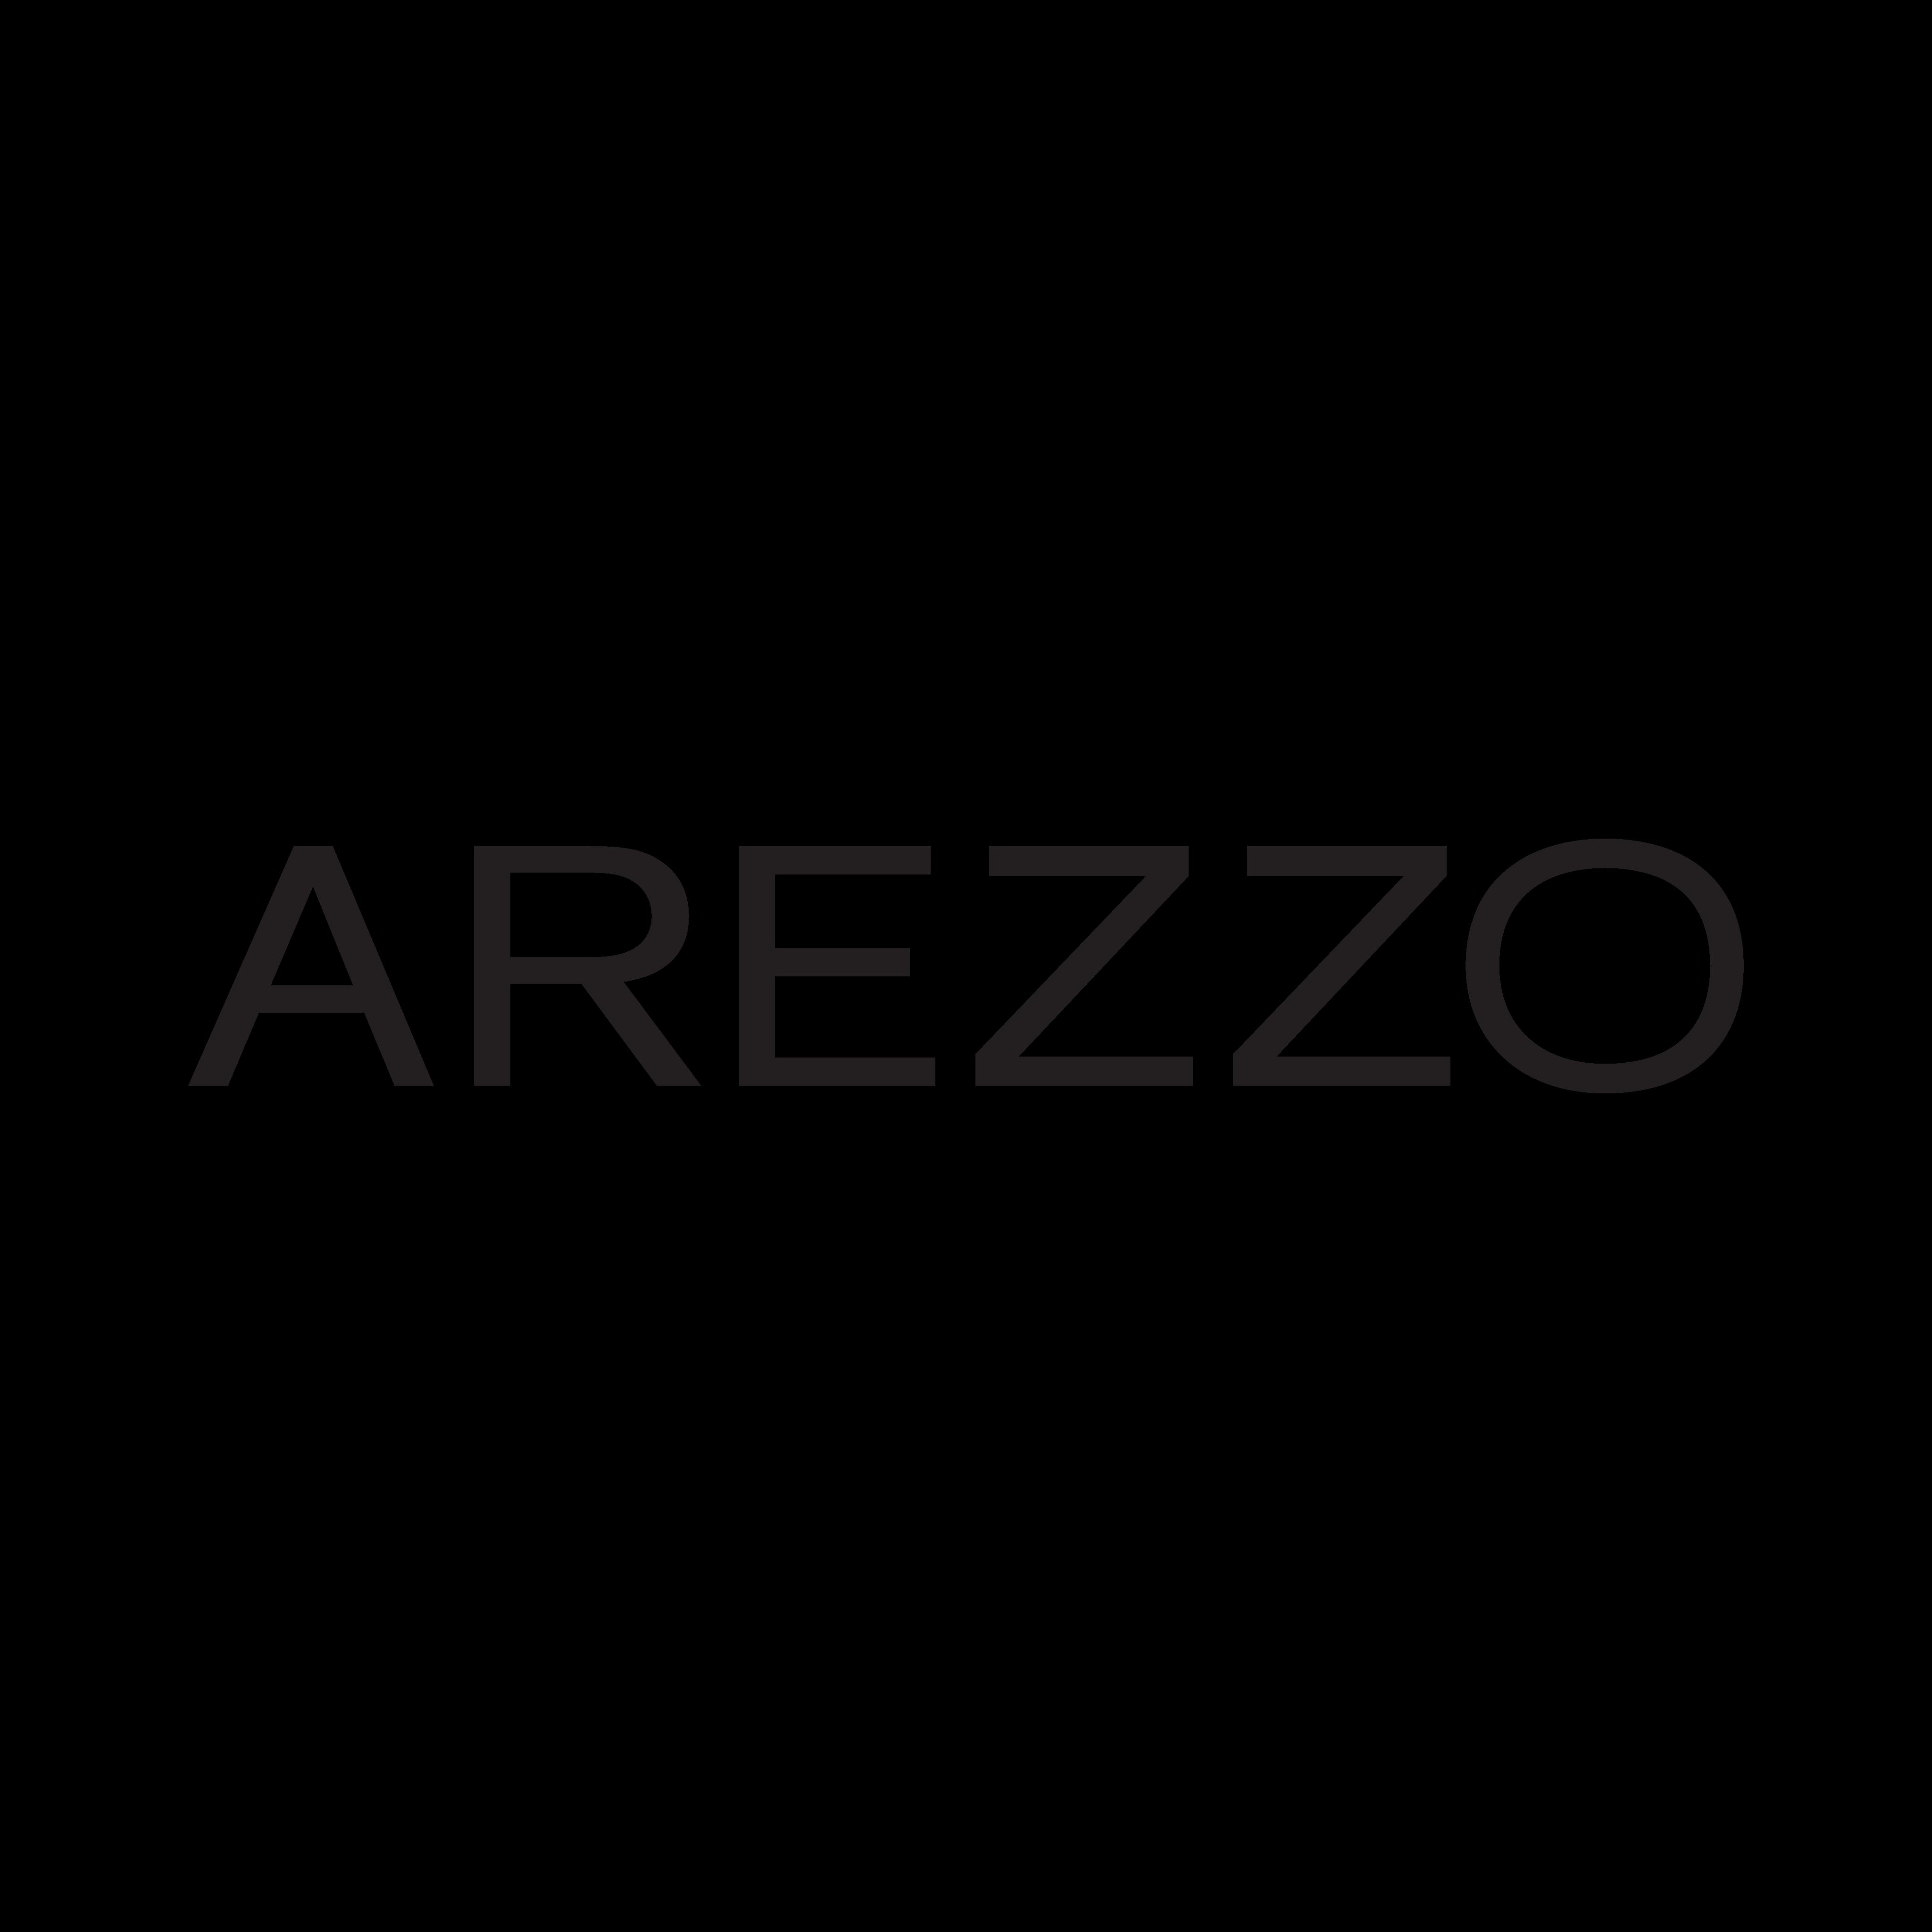 Arezzo Logo PNG.